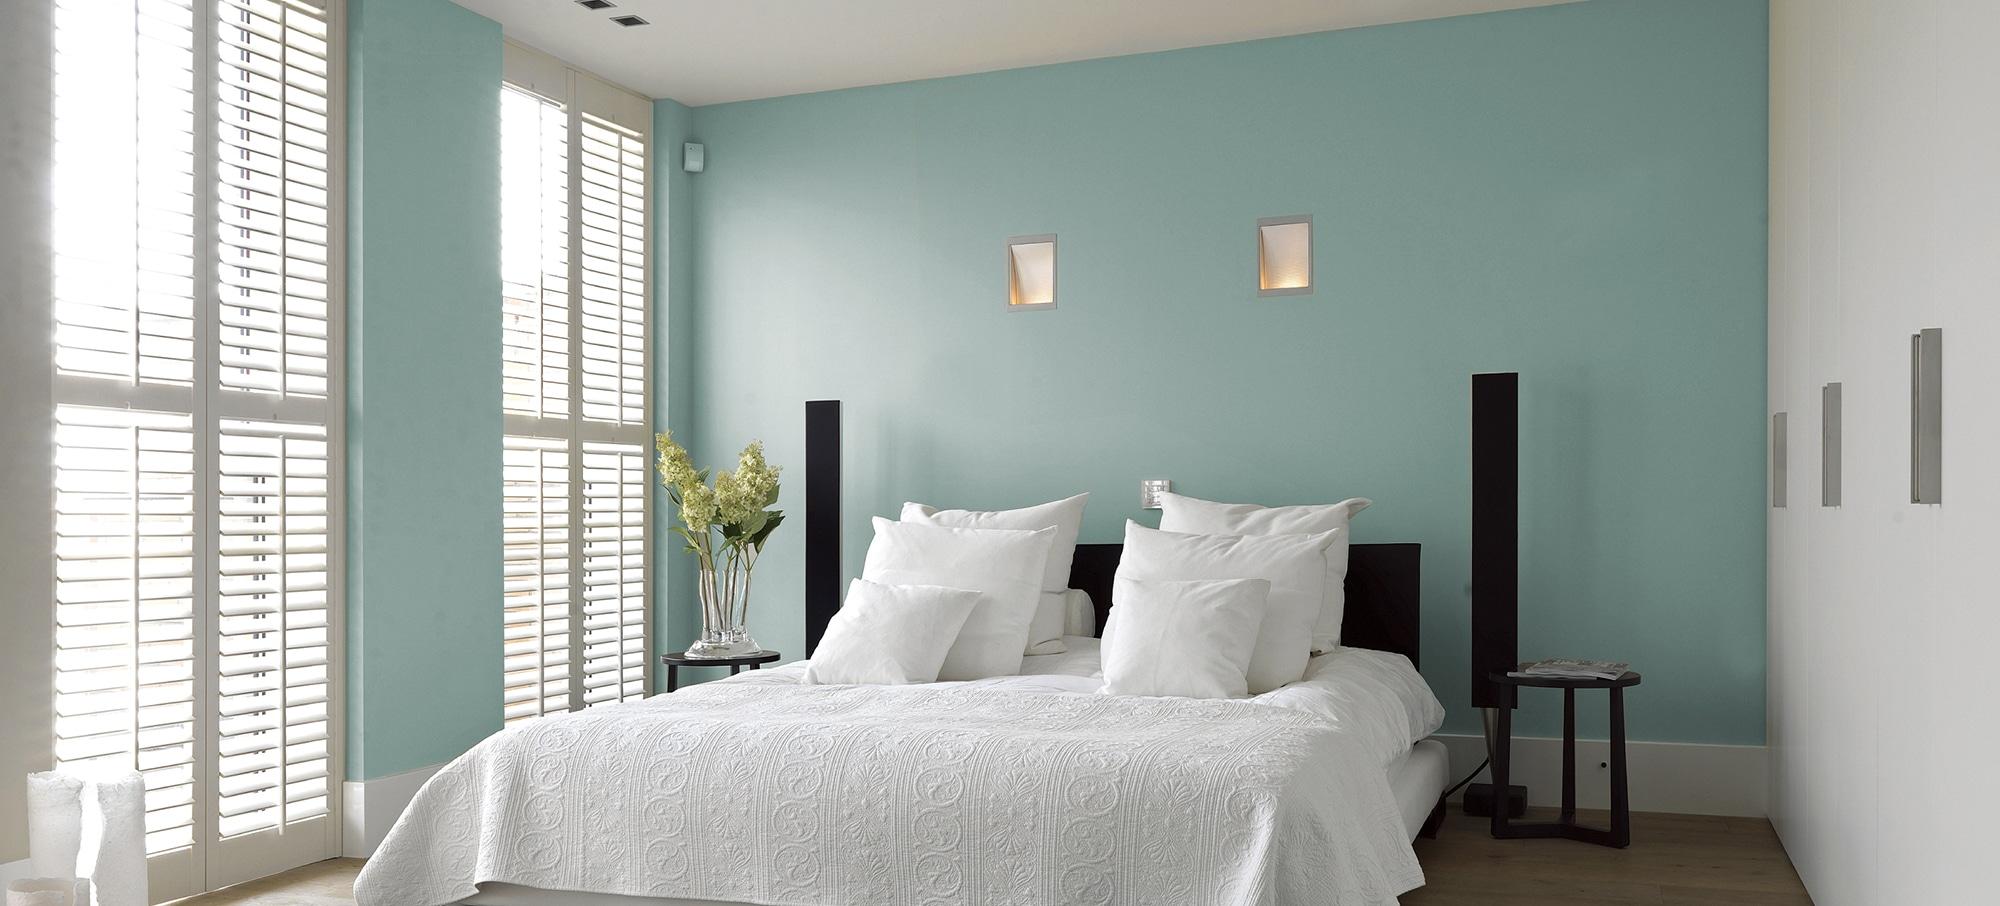 bedroom window shutters